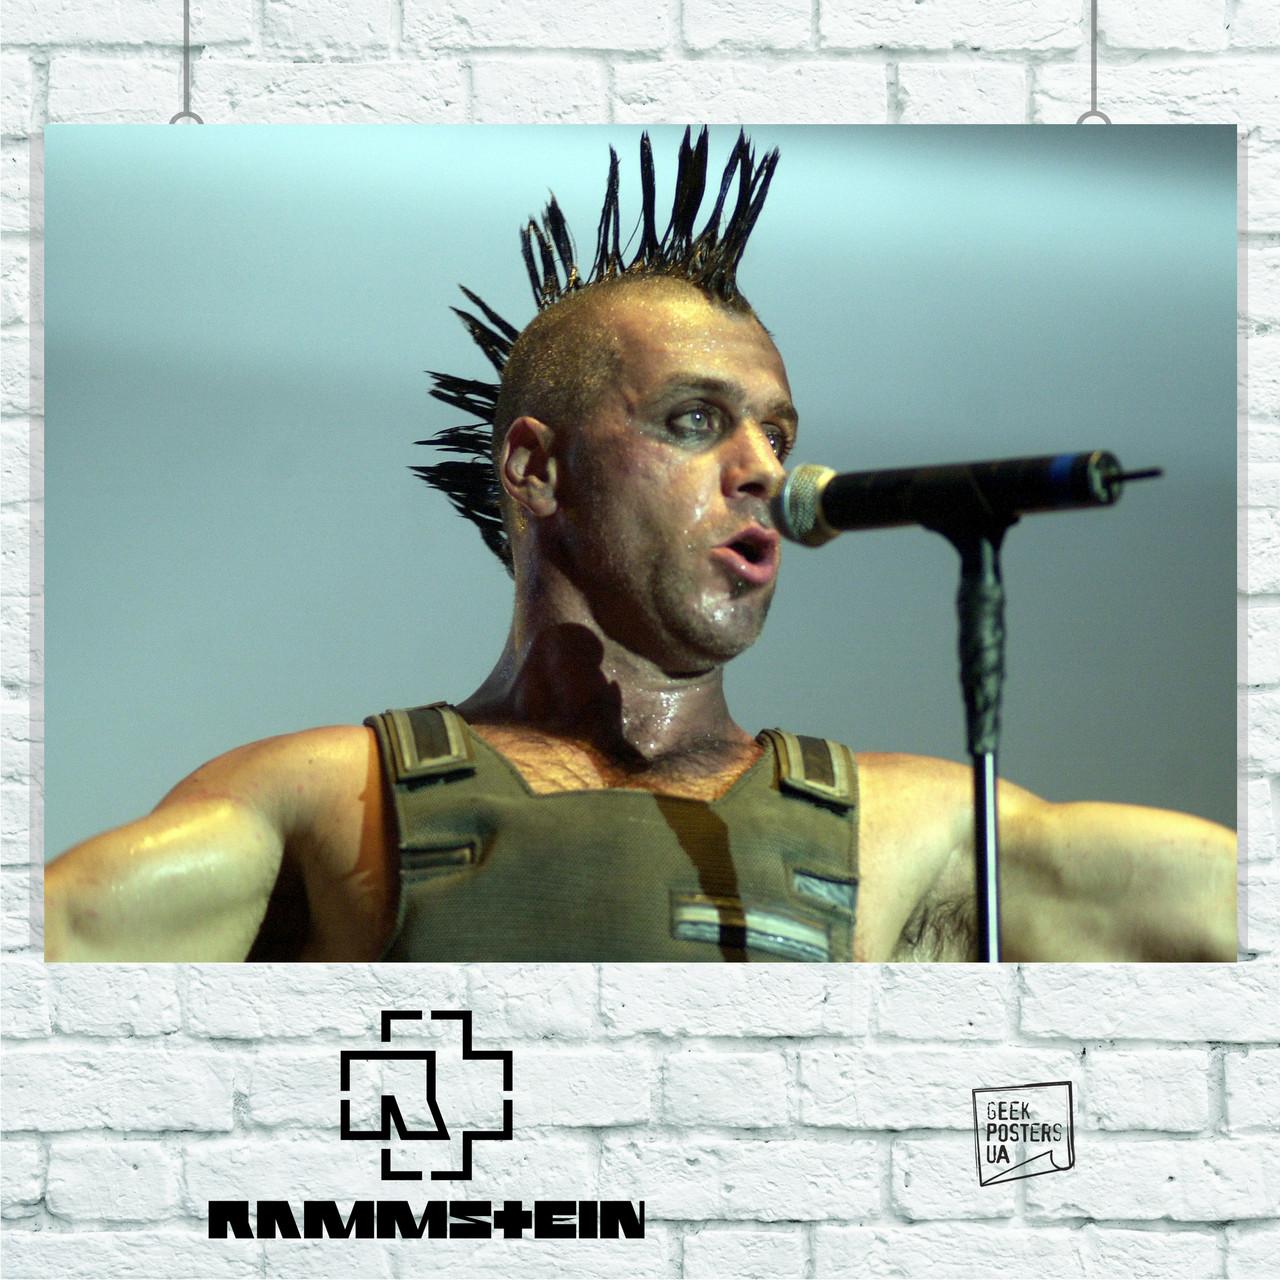 "Постер Rammstein: Тилль с ""ирокезом"", Рамштайн. Размер 60x39см (A2). Глянцевая бумага"